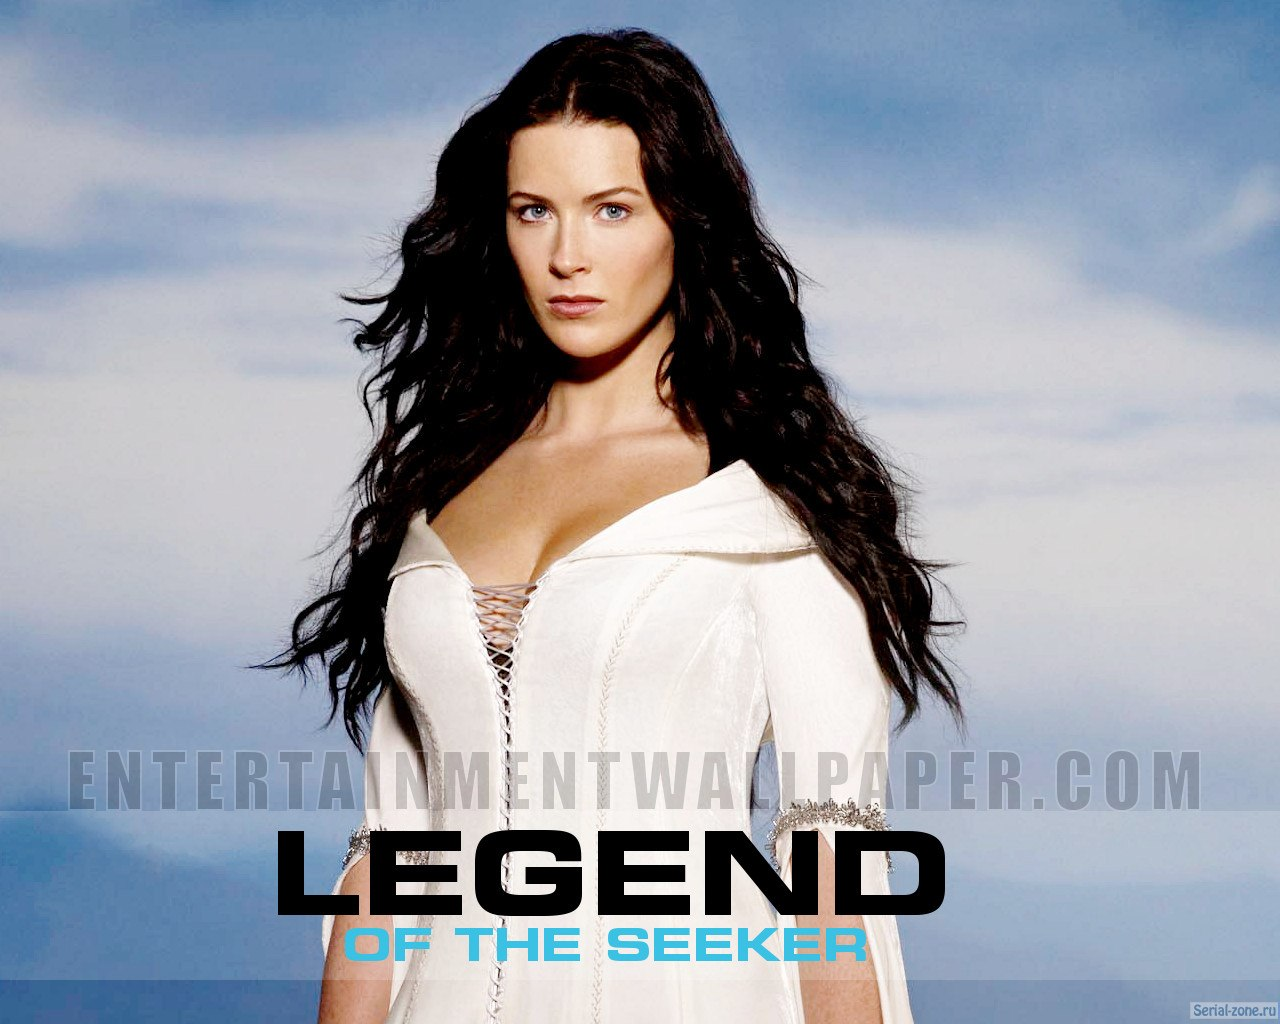 http://serial-zone.ru/inc/goods_wallpapers/legend_of_the_seeker/legend_of_the_seeker5.jpg